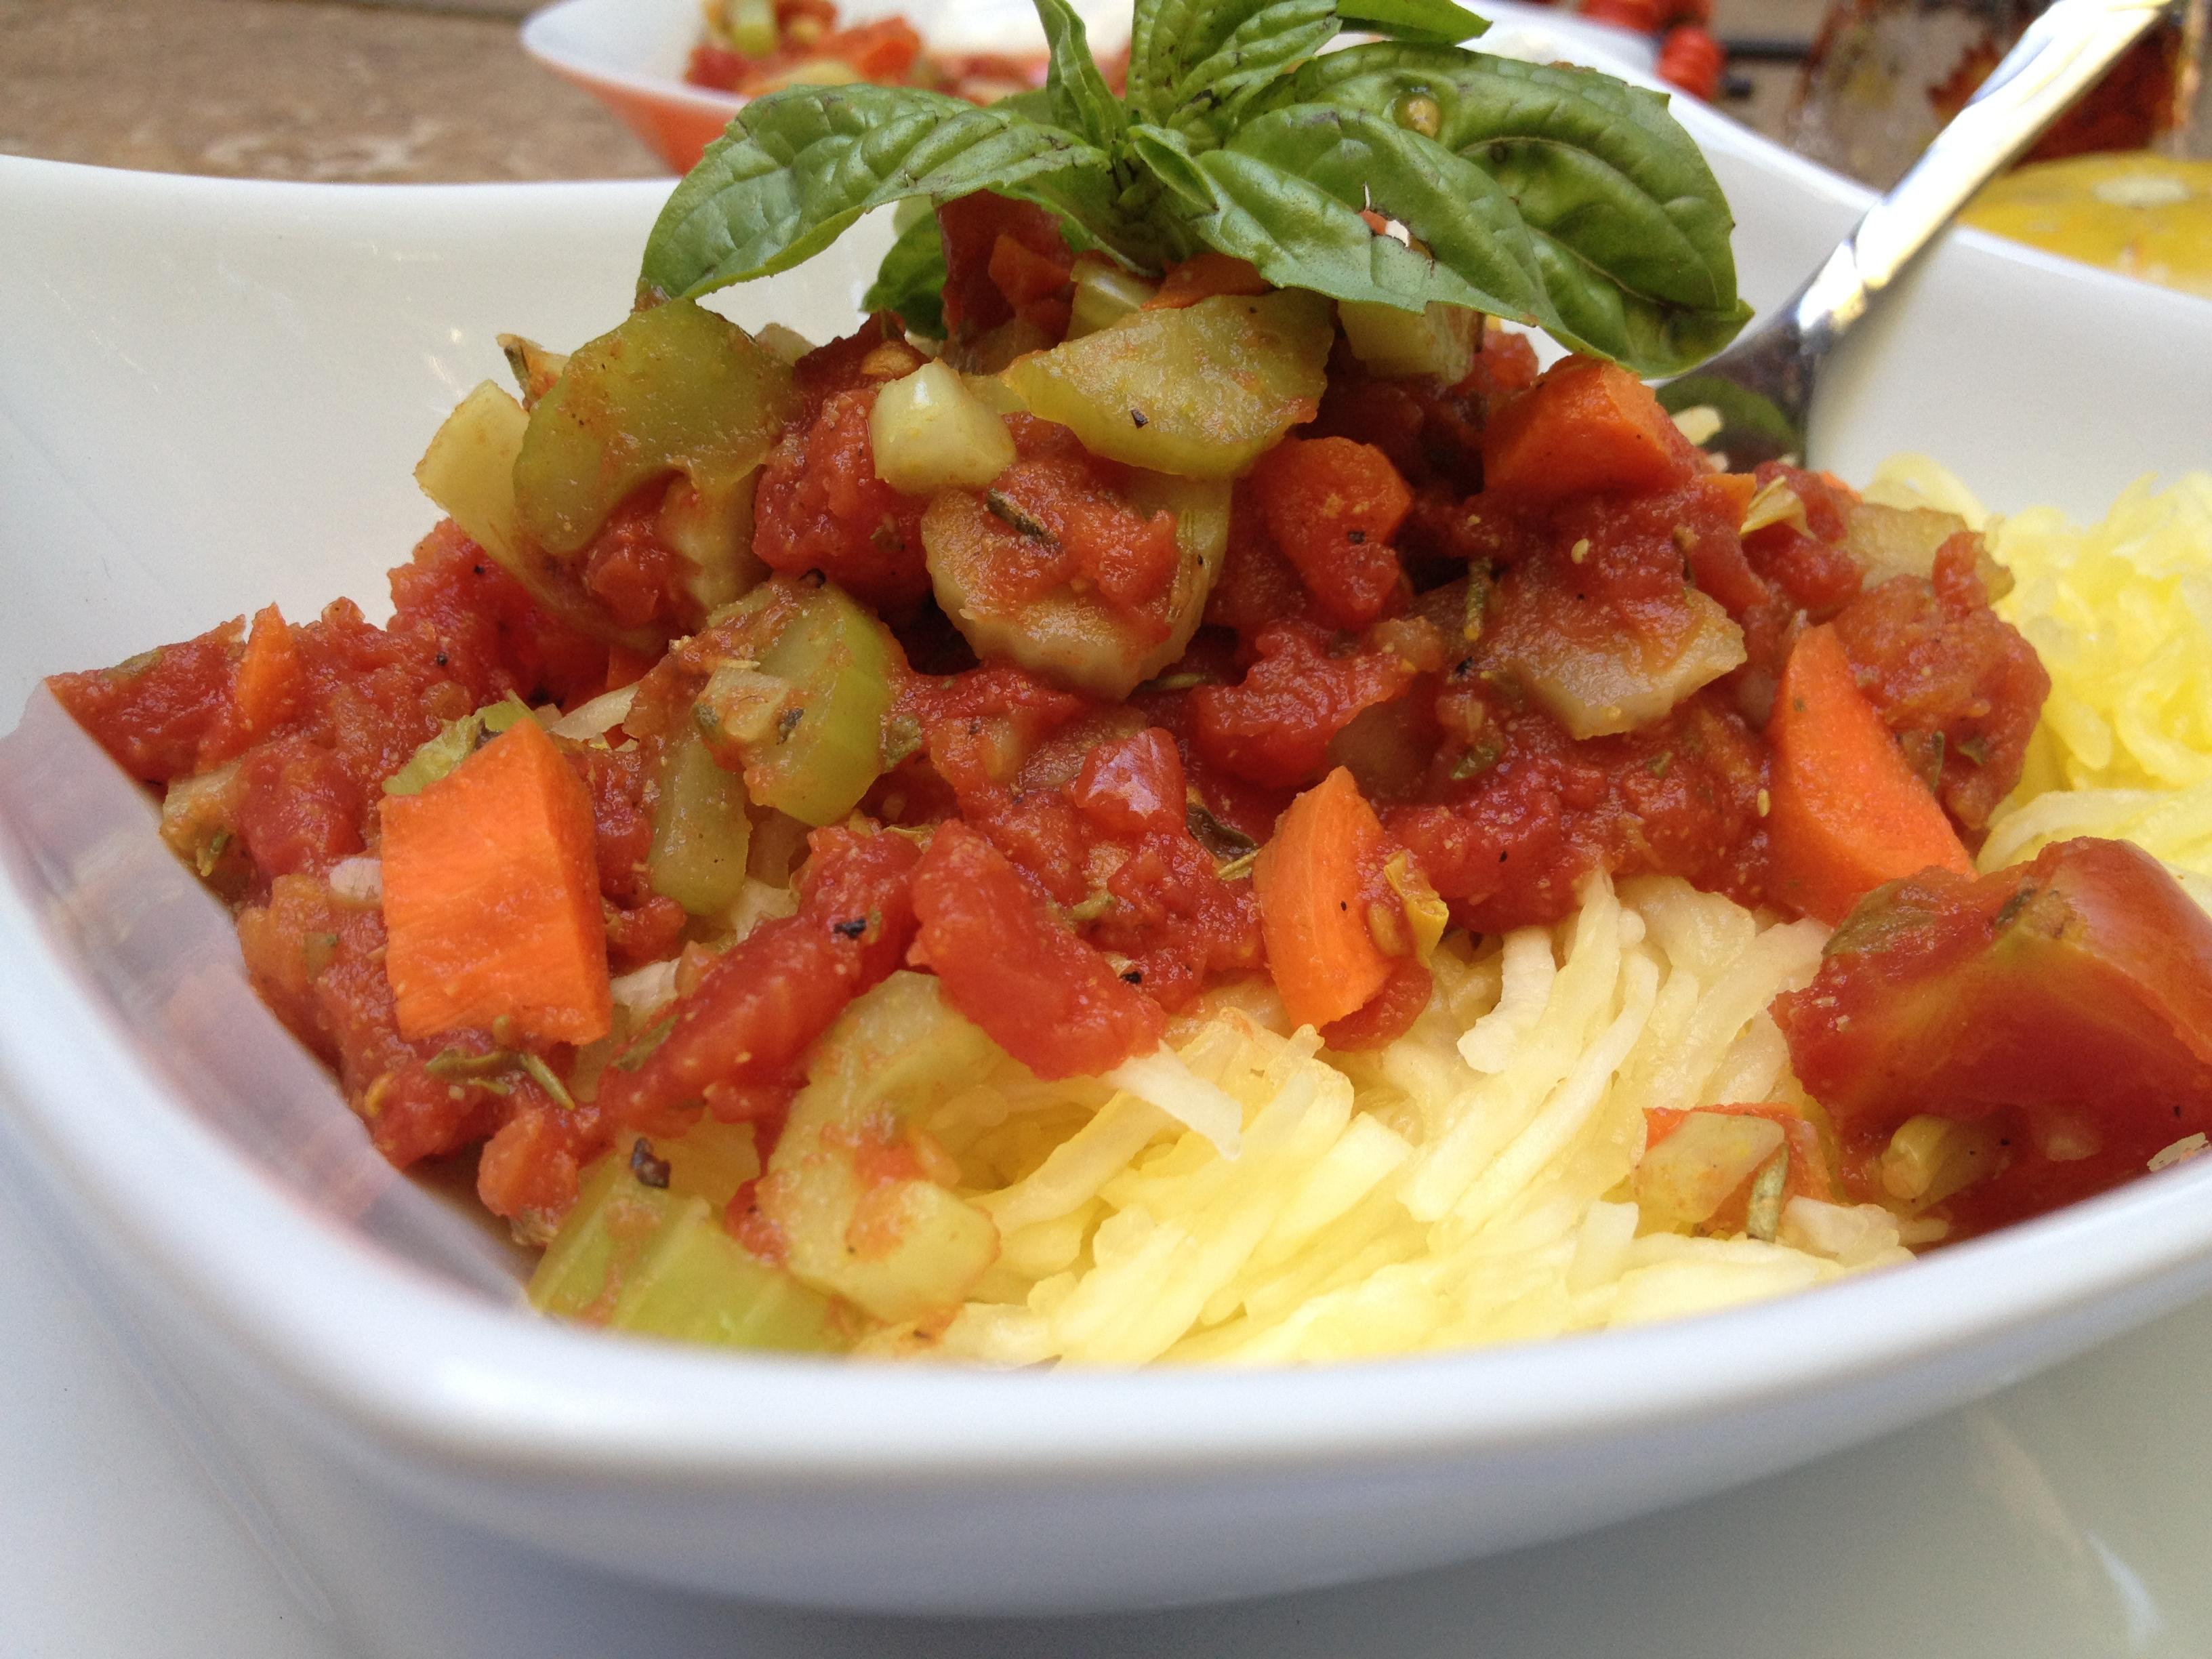 Homemade Tomato Spaghetti Squash Meal